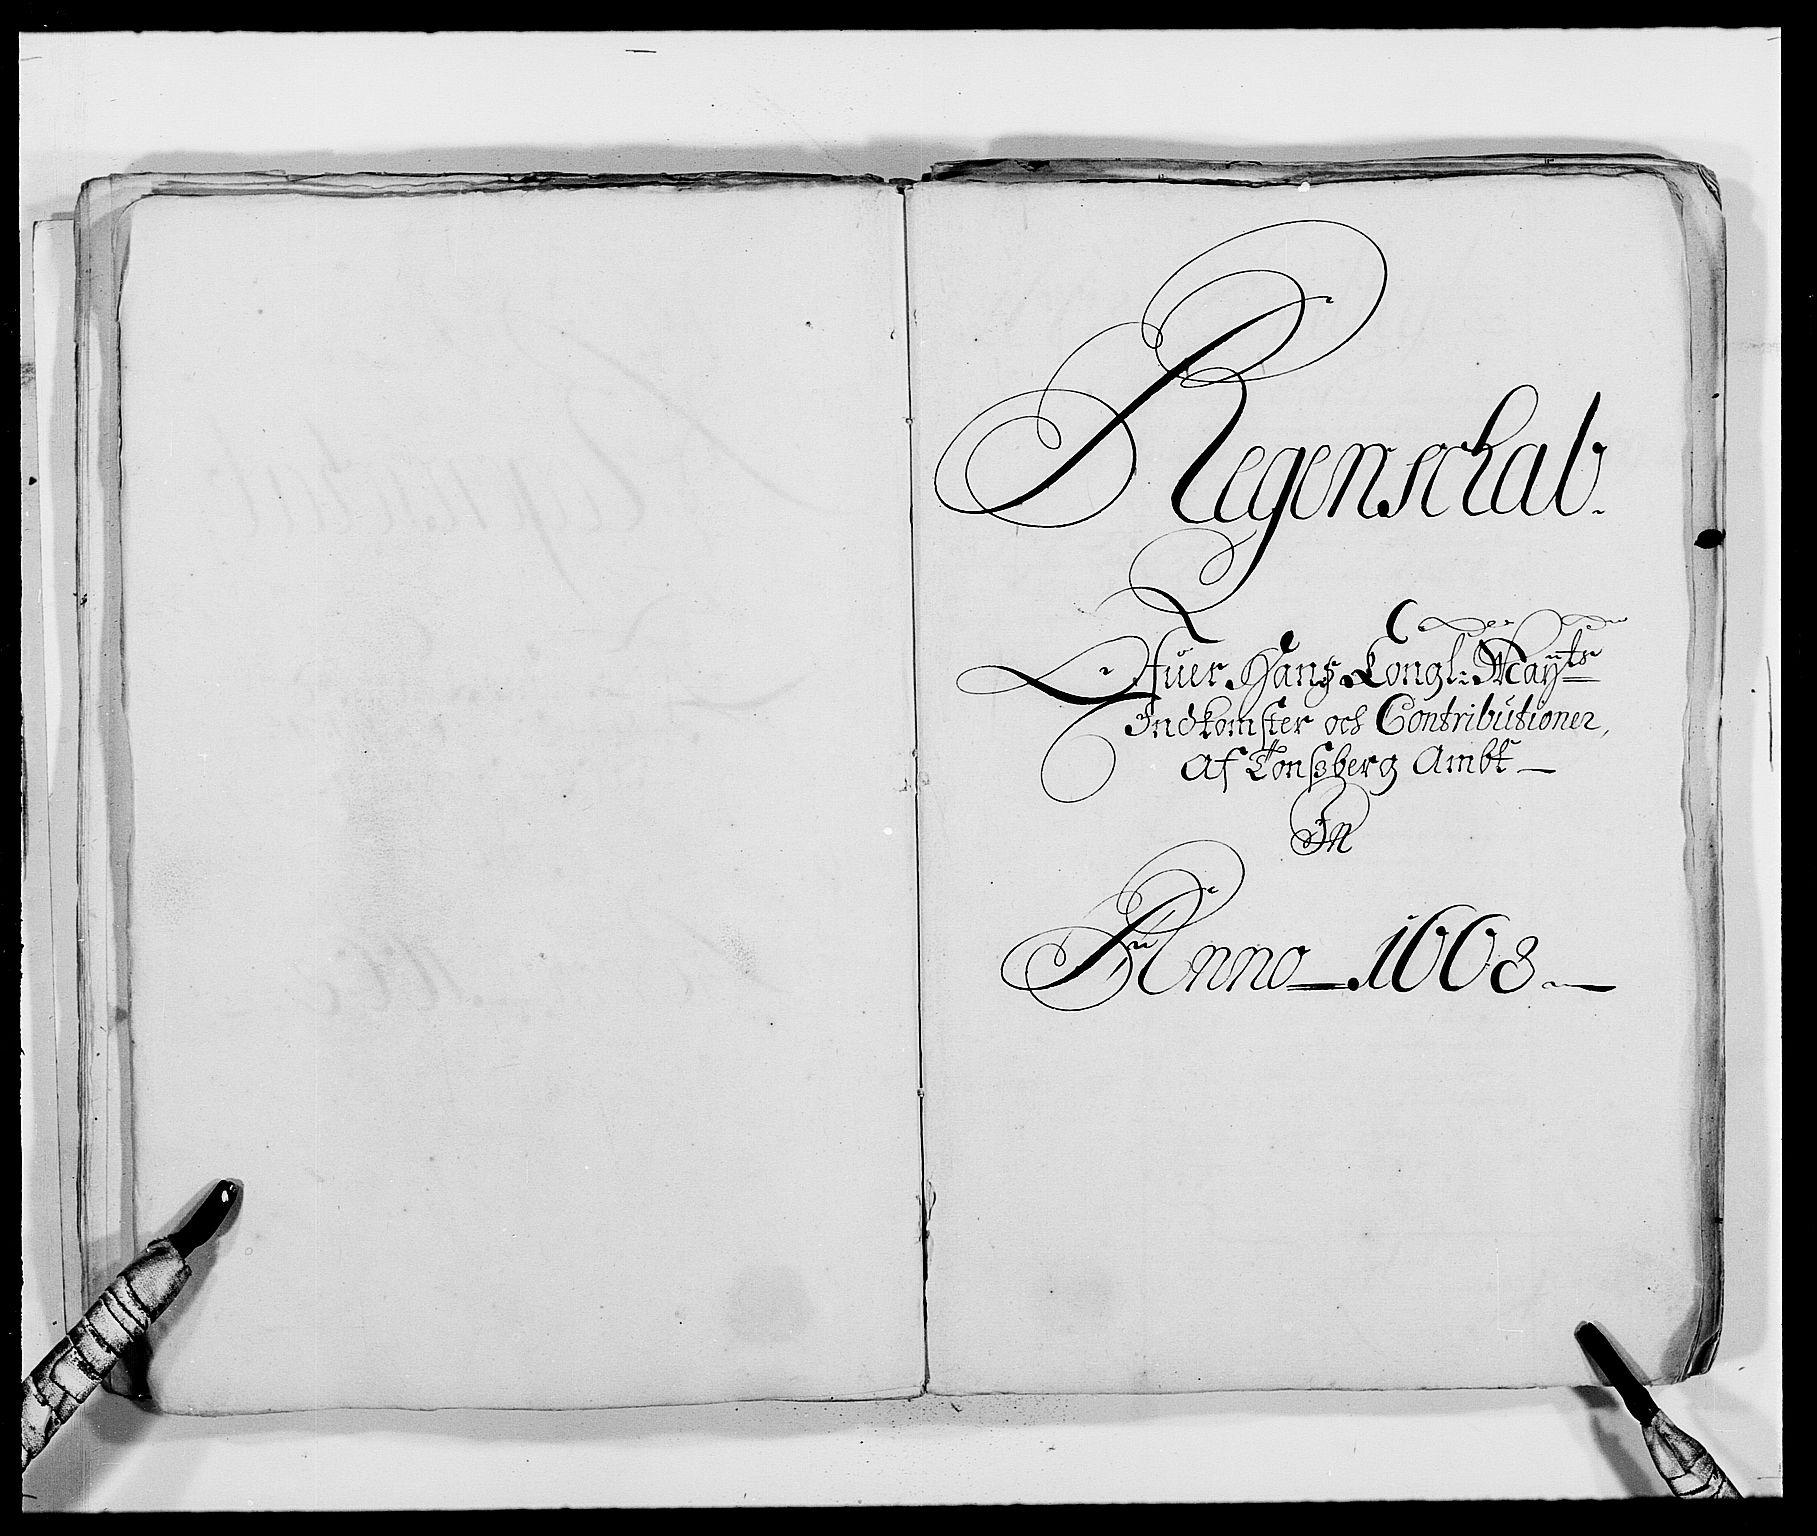 RA, Rentekammeret inntil 1814, Reviderte regnskaper, Fogderegnskap, R32/L1839: Fogderegnskap Jarlsberg grevskap, 1664-1673, s. 56